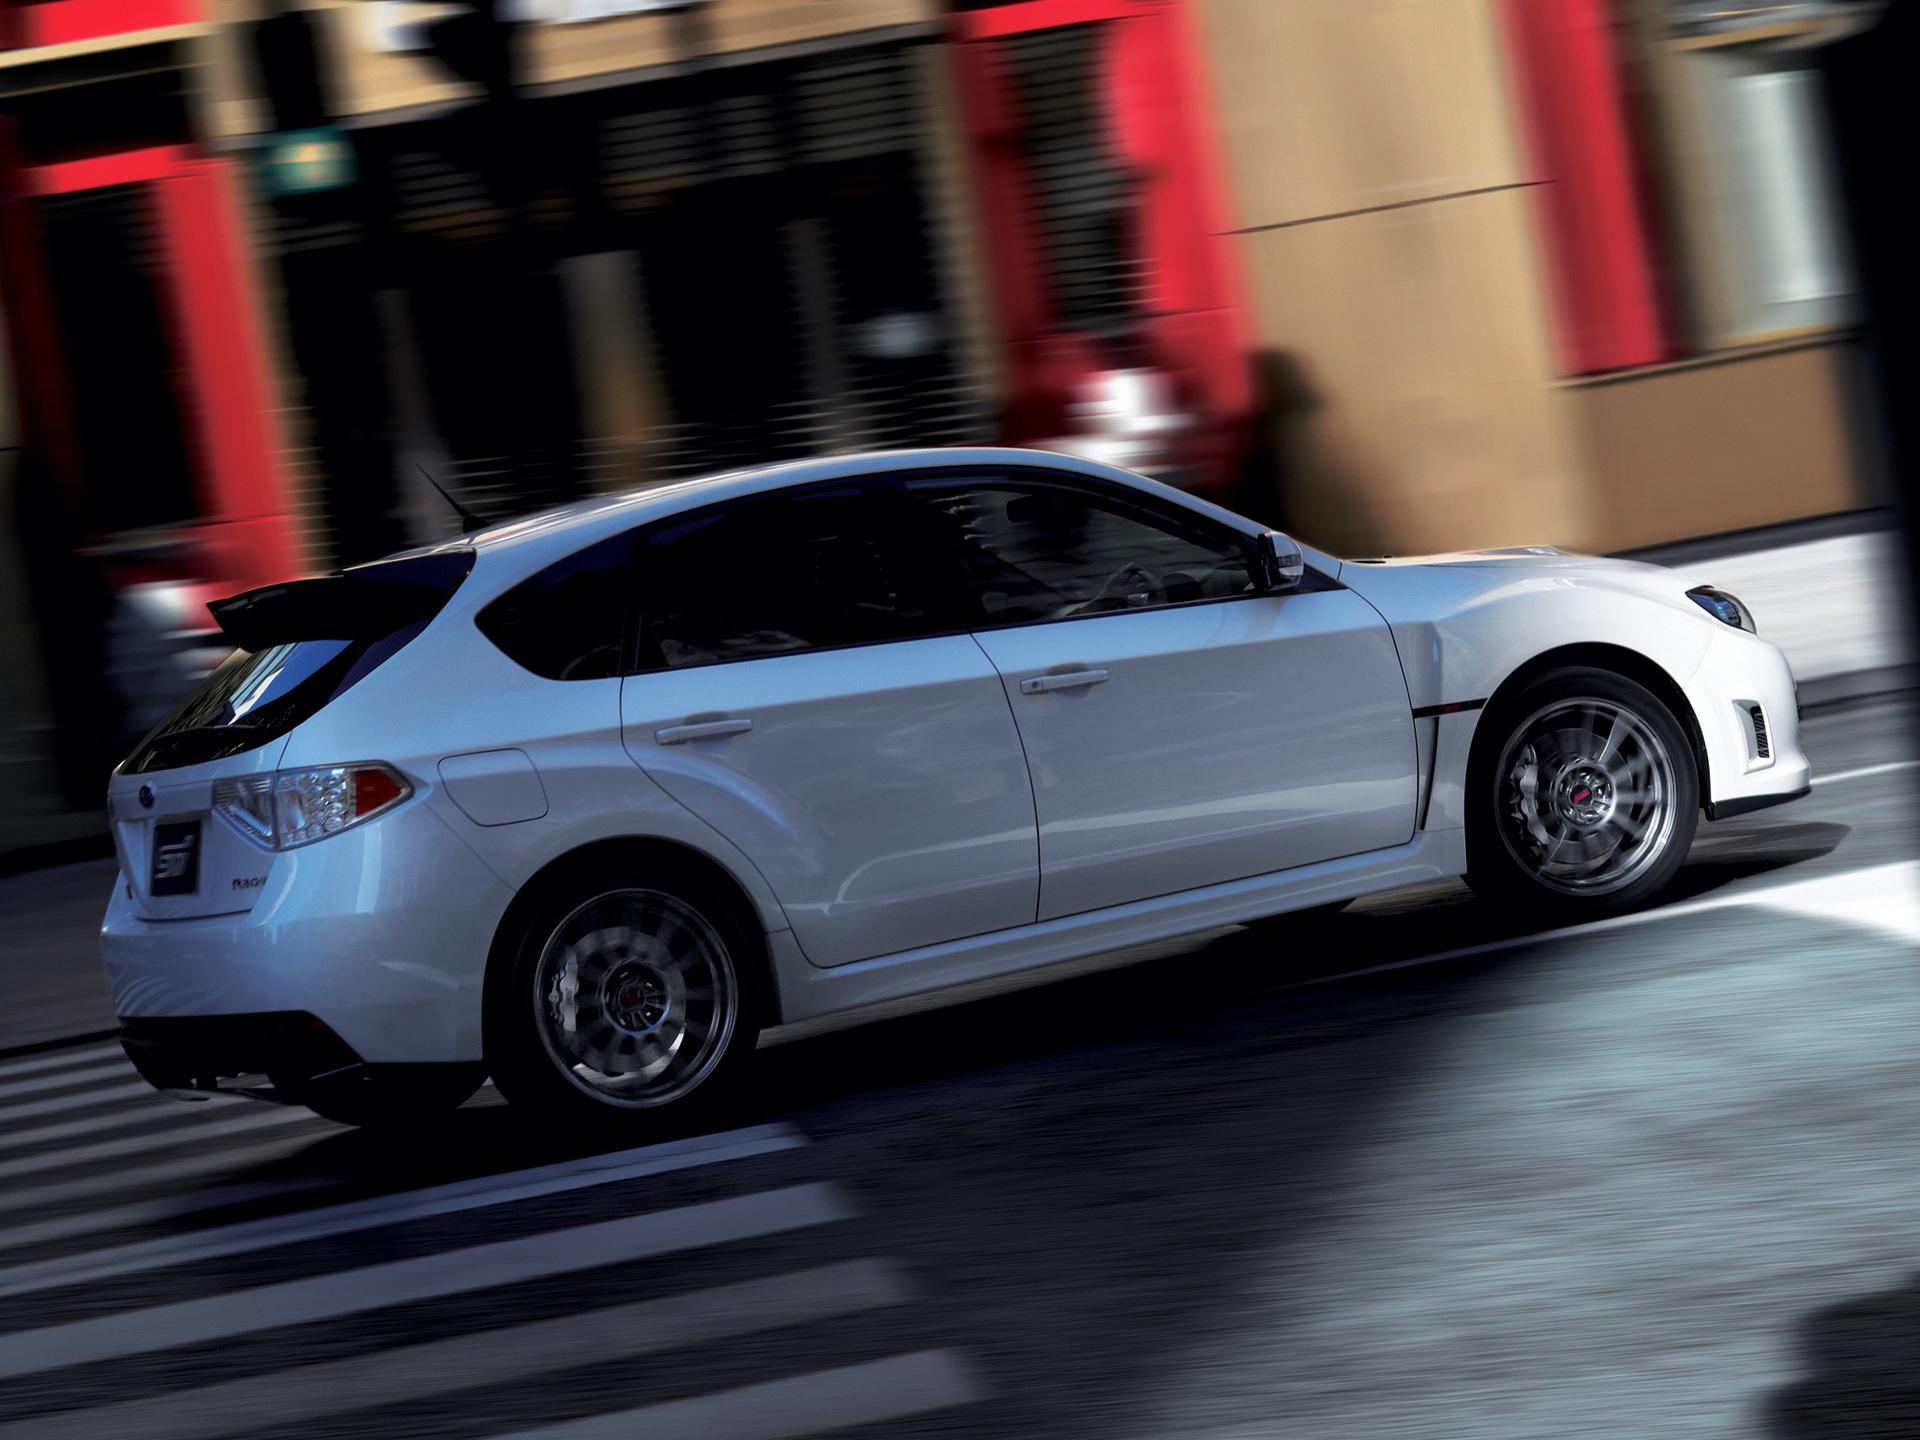 Subaru_Impreza_STI_R205_0004